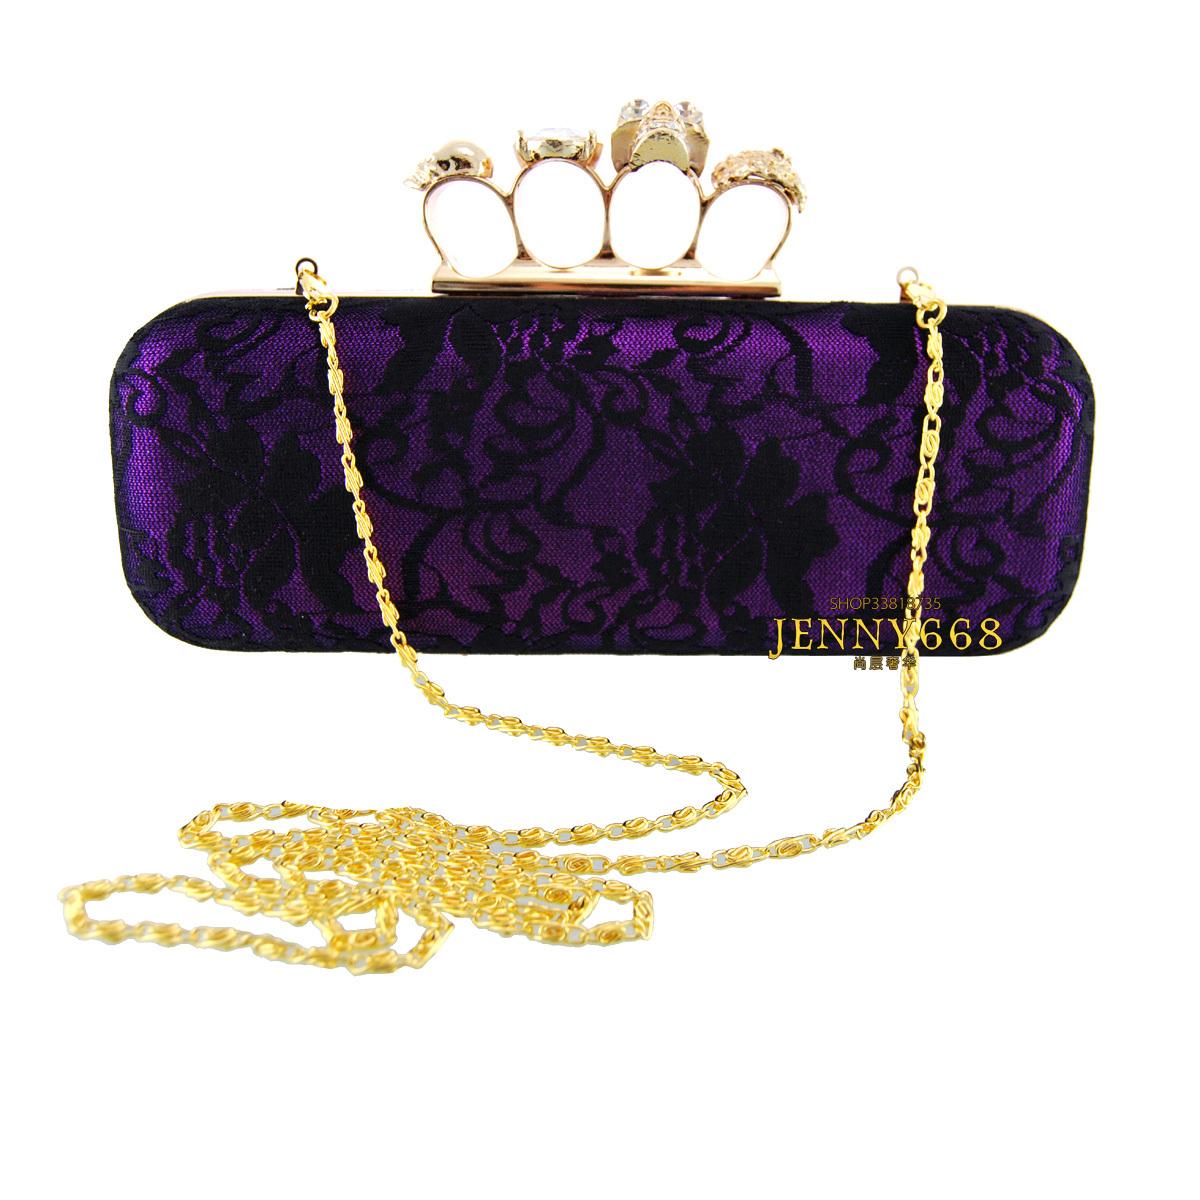 Fashion fashion brief vintage lace ring diamond skull day clutch women's handbag bag wedding package(China (Mainland))